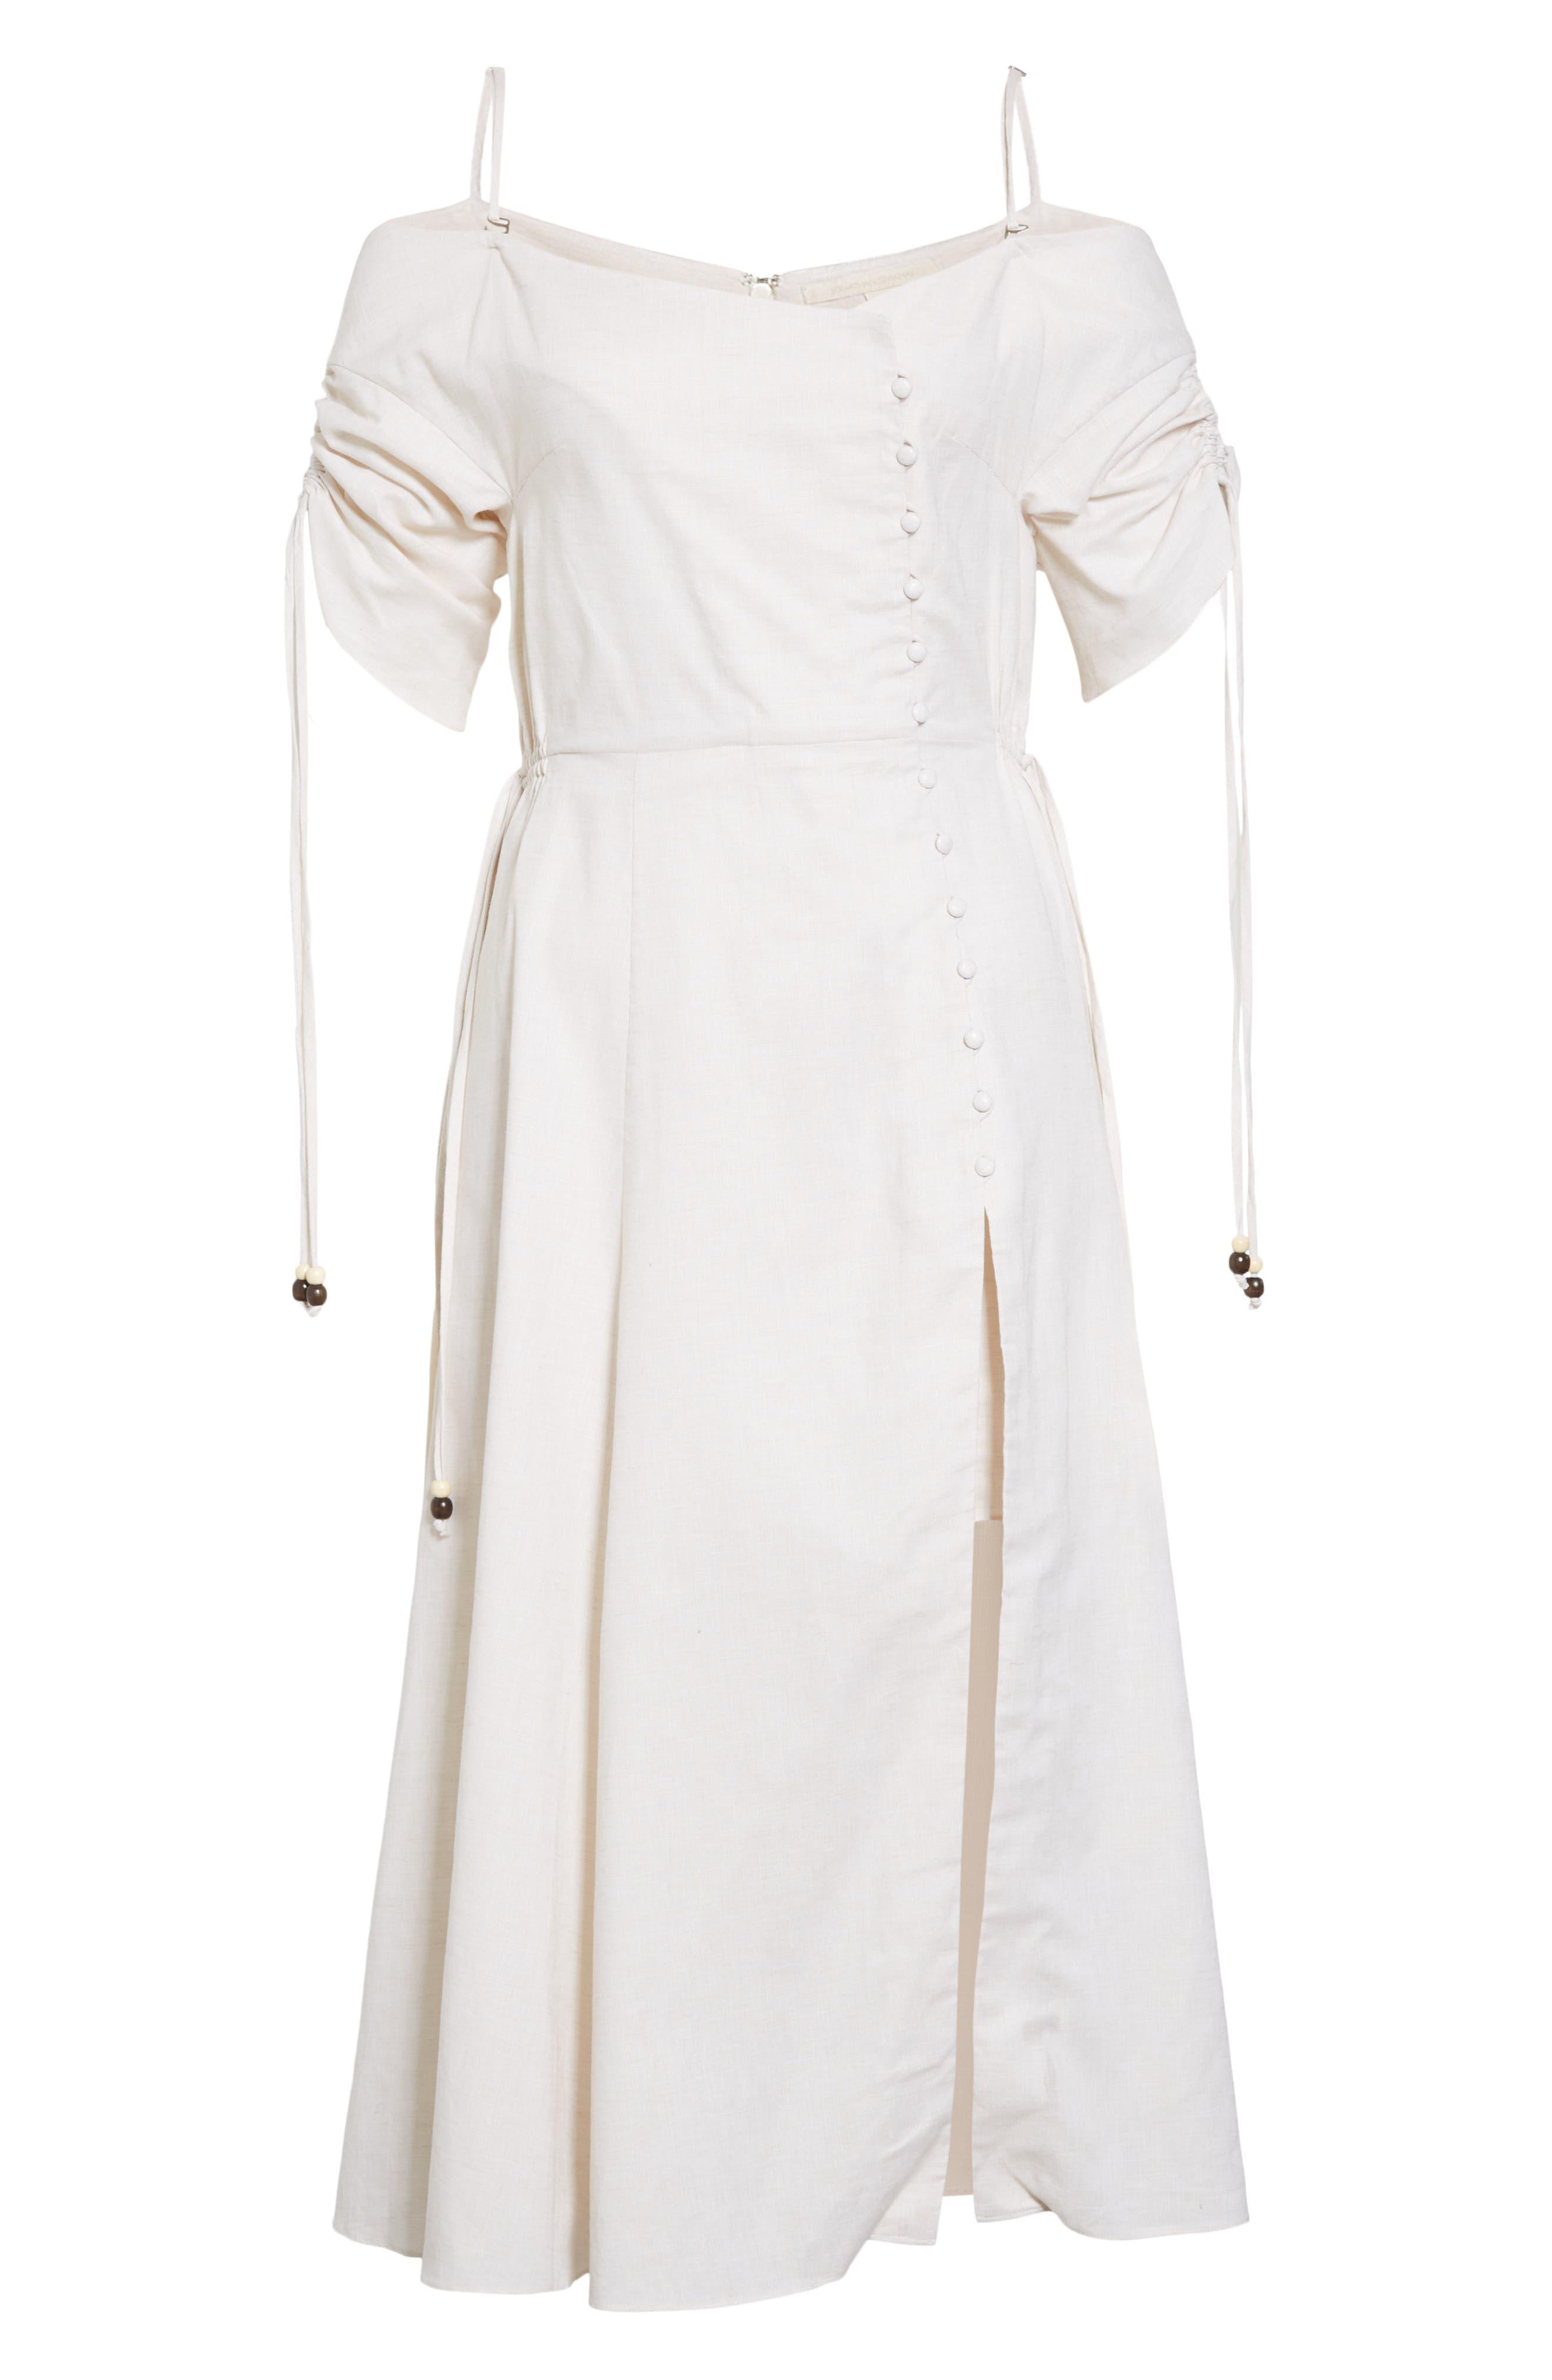 JONATHAN SIMKHAI,                             Off the Shoulder Cotton & Linen Dress,                             Alternate thumbnail 6, color,                             ECRU